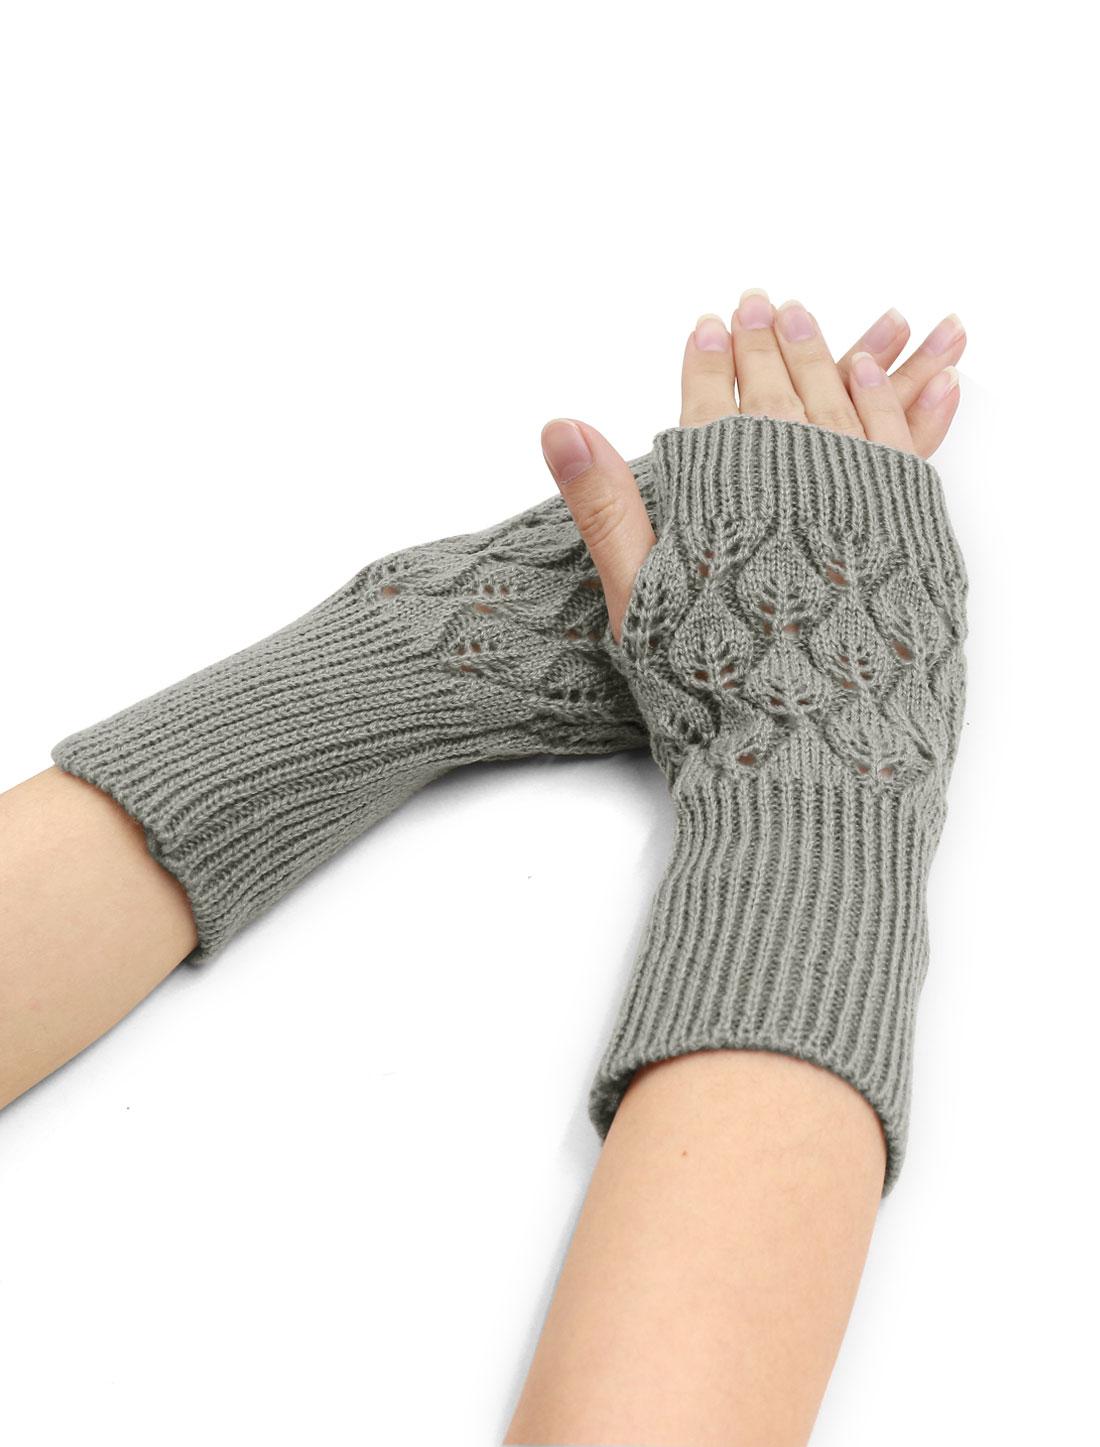 Women Wrist Length Leaves Design Knit Arm Warmers Pair Light Gray